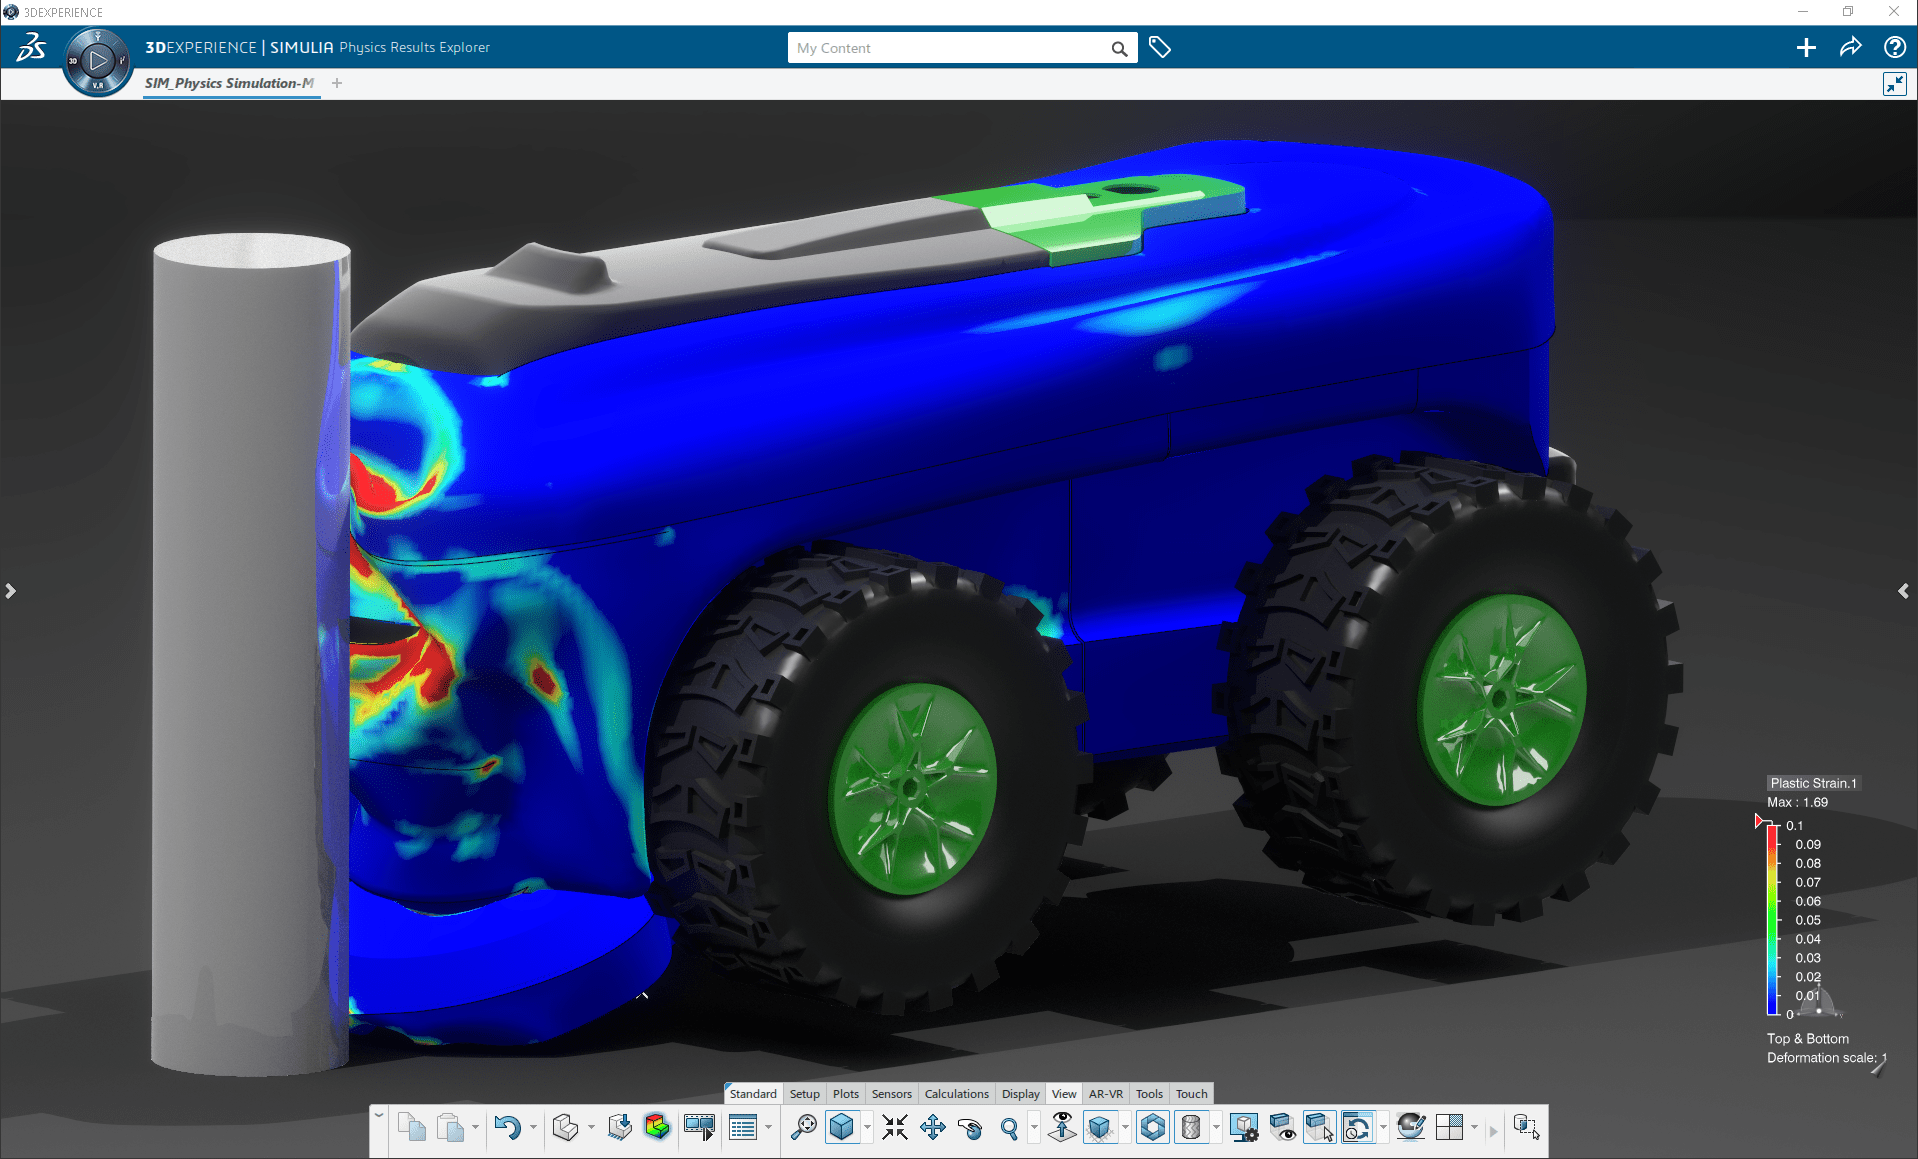 3DEXPERIENCE SIMULIA Physics Results Explorer: Fahrzeugsimulation